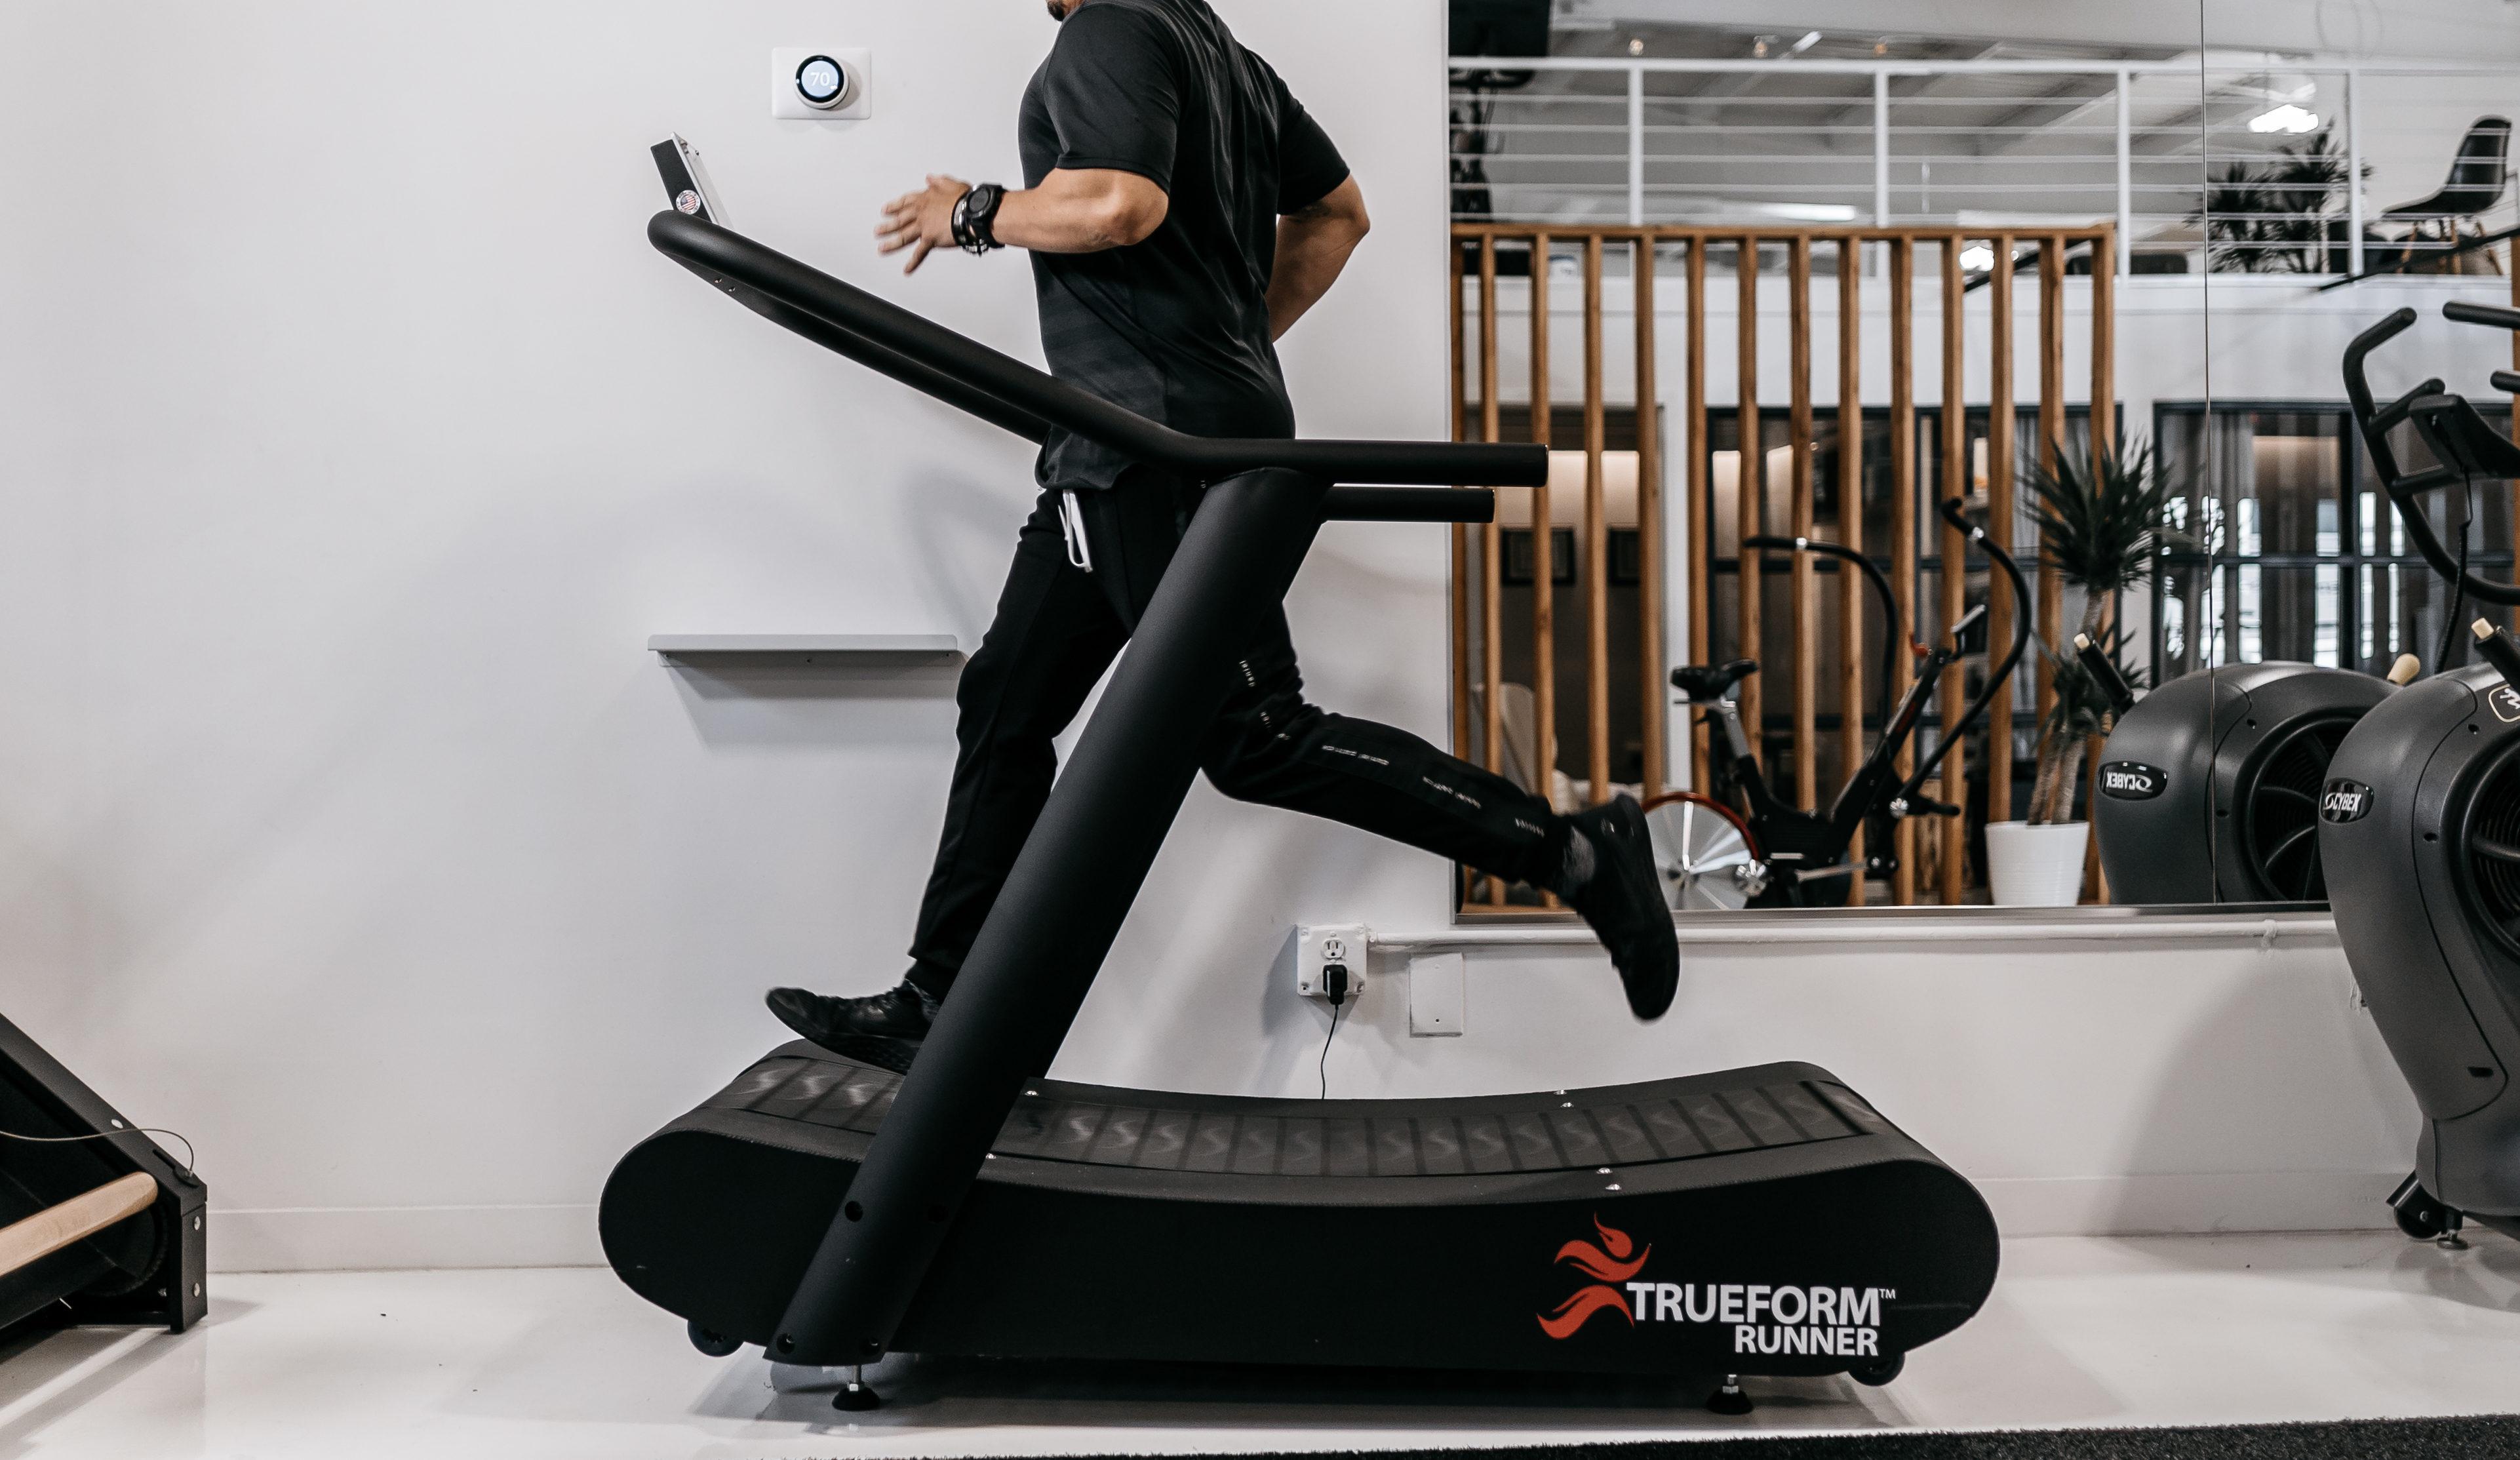 trueform runner machine Driven + SWS Tampa Personal Trainer